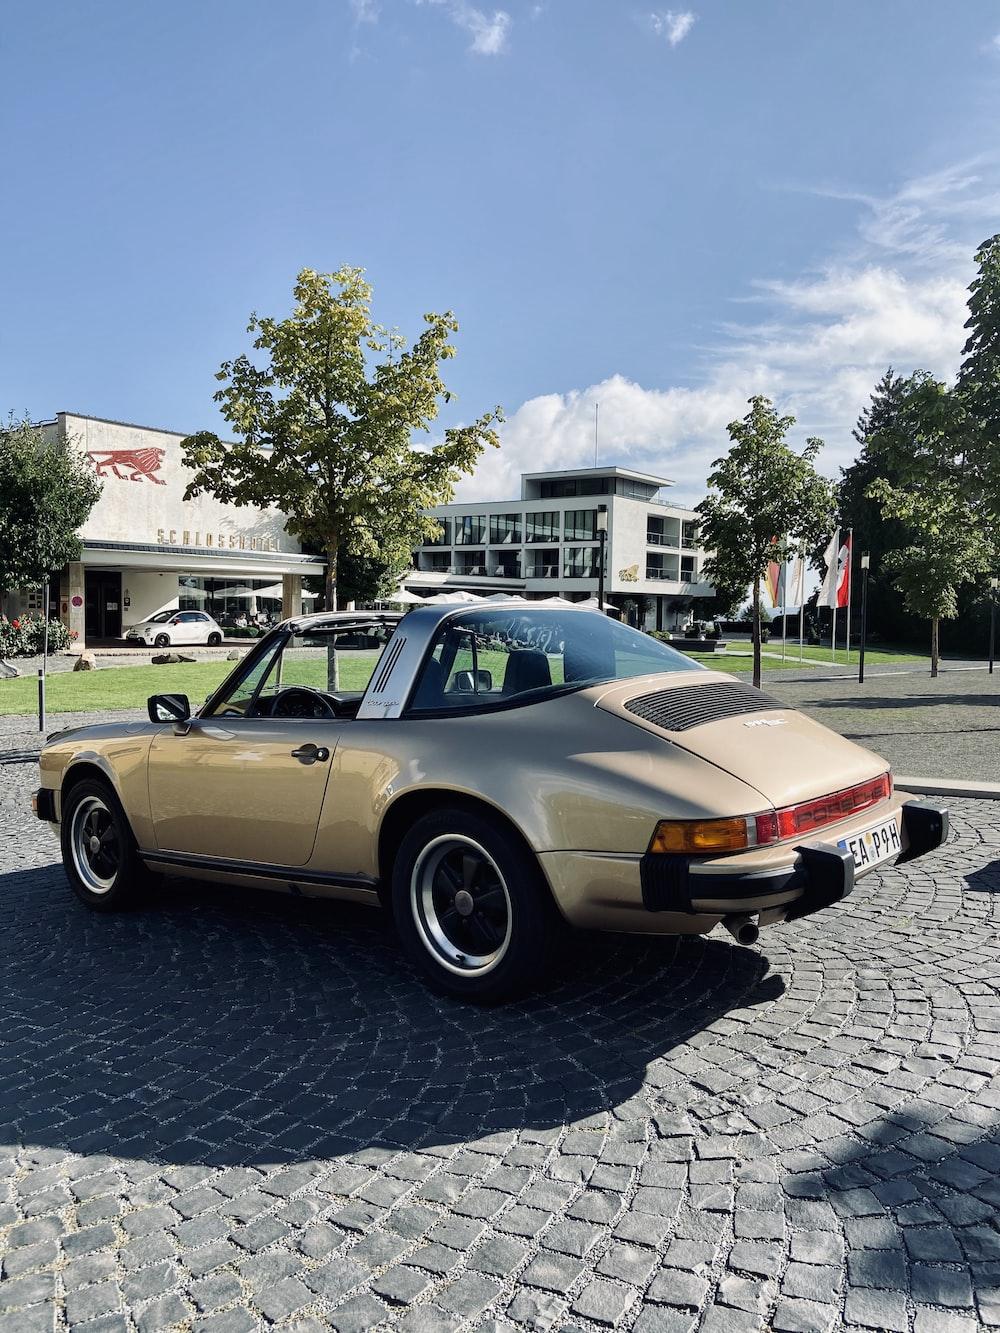 gold chevrolet camaro parked on street during daytime